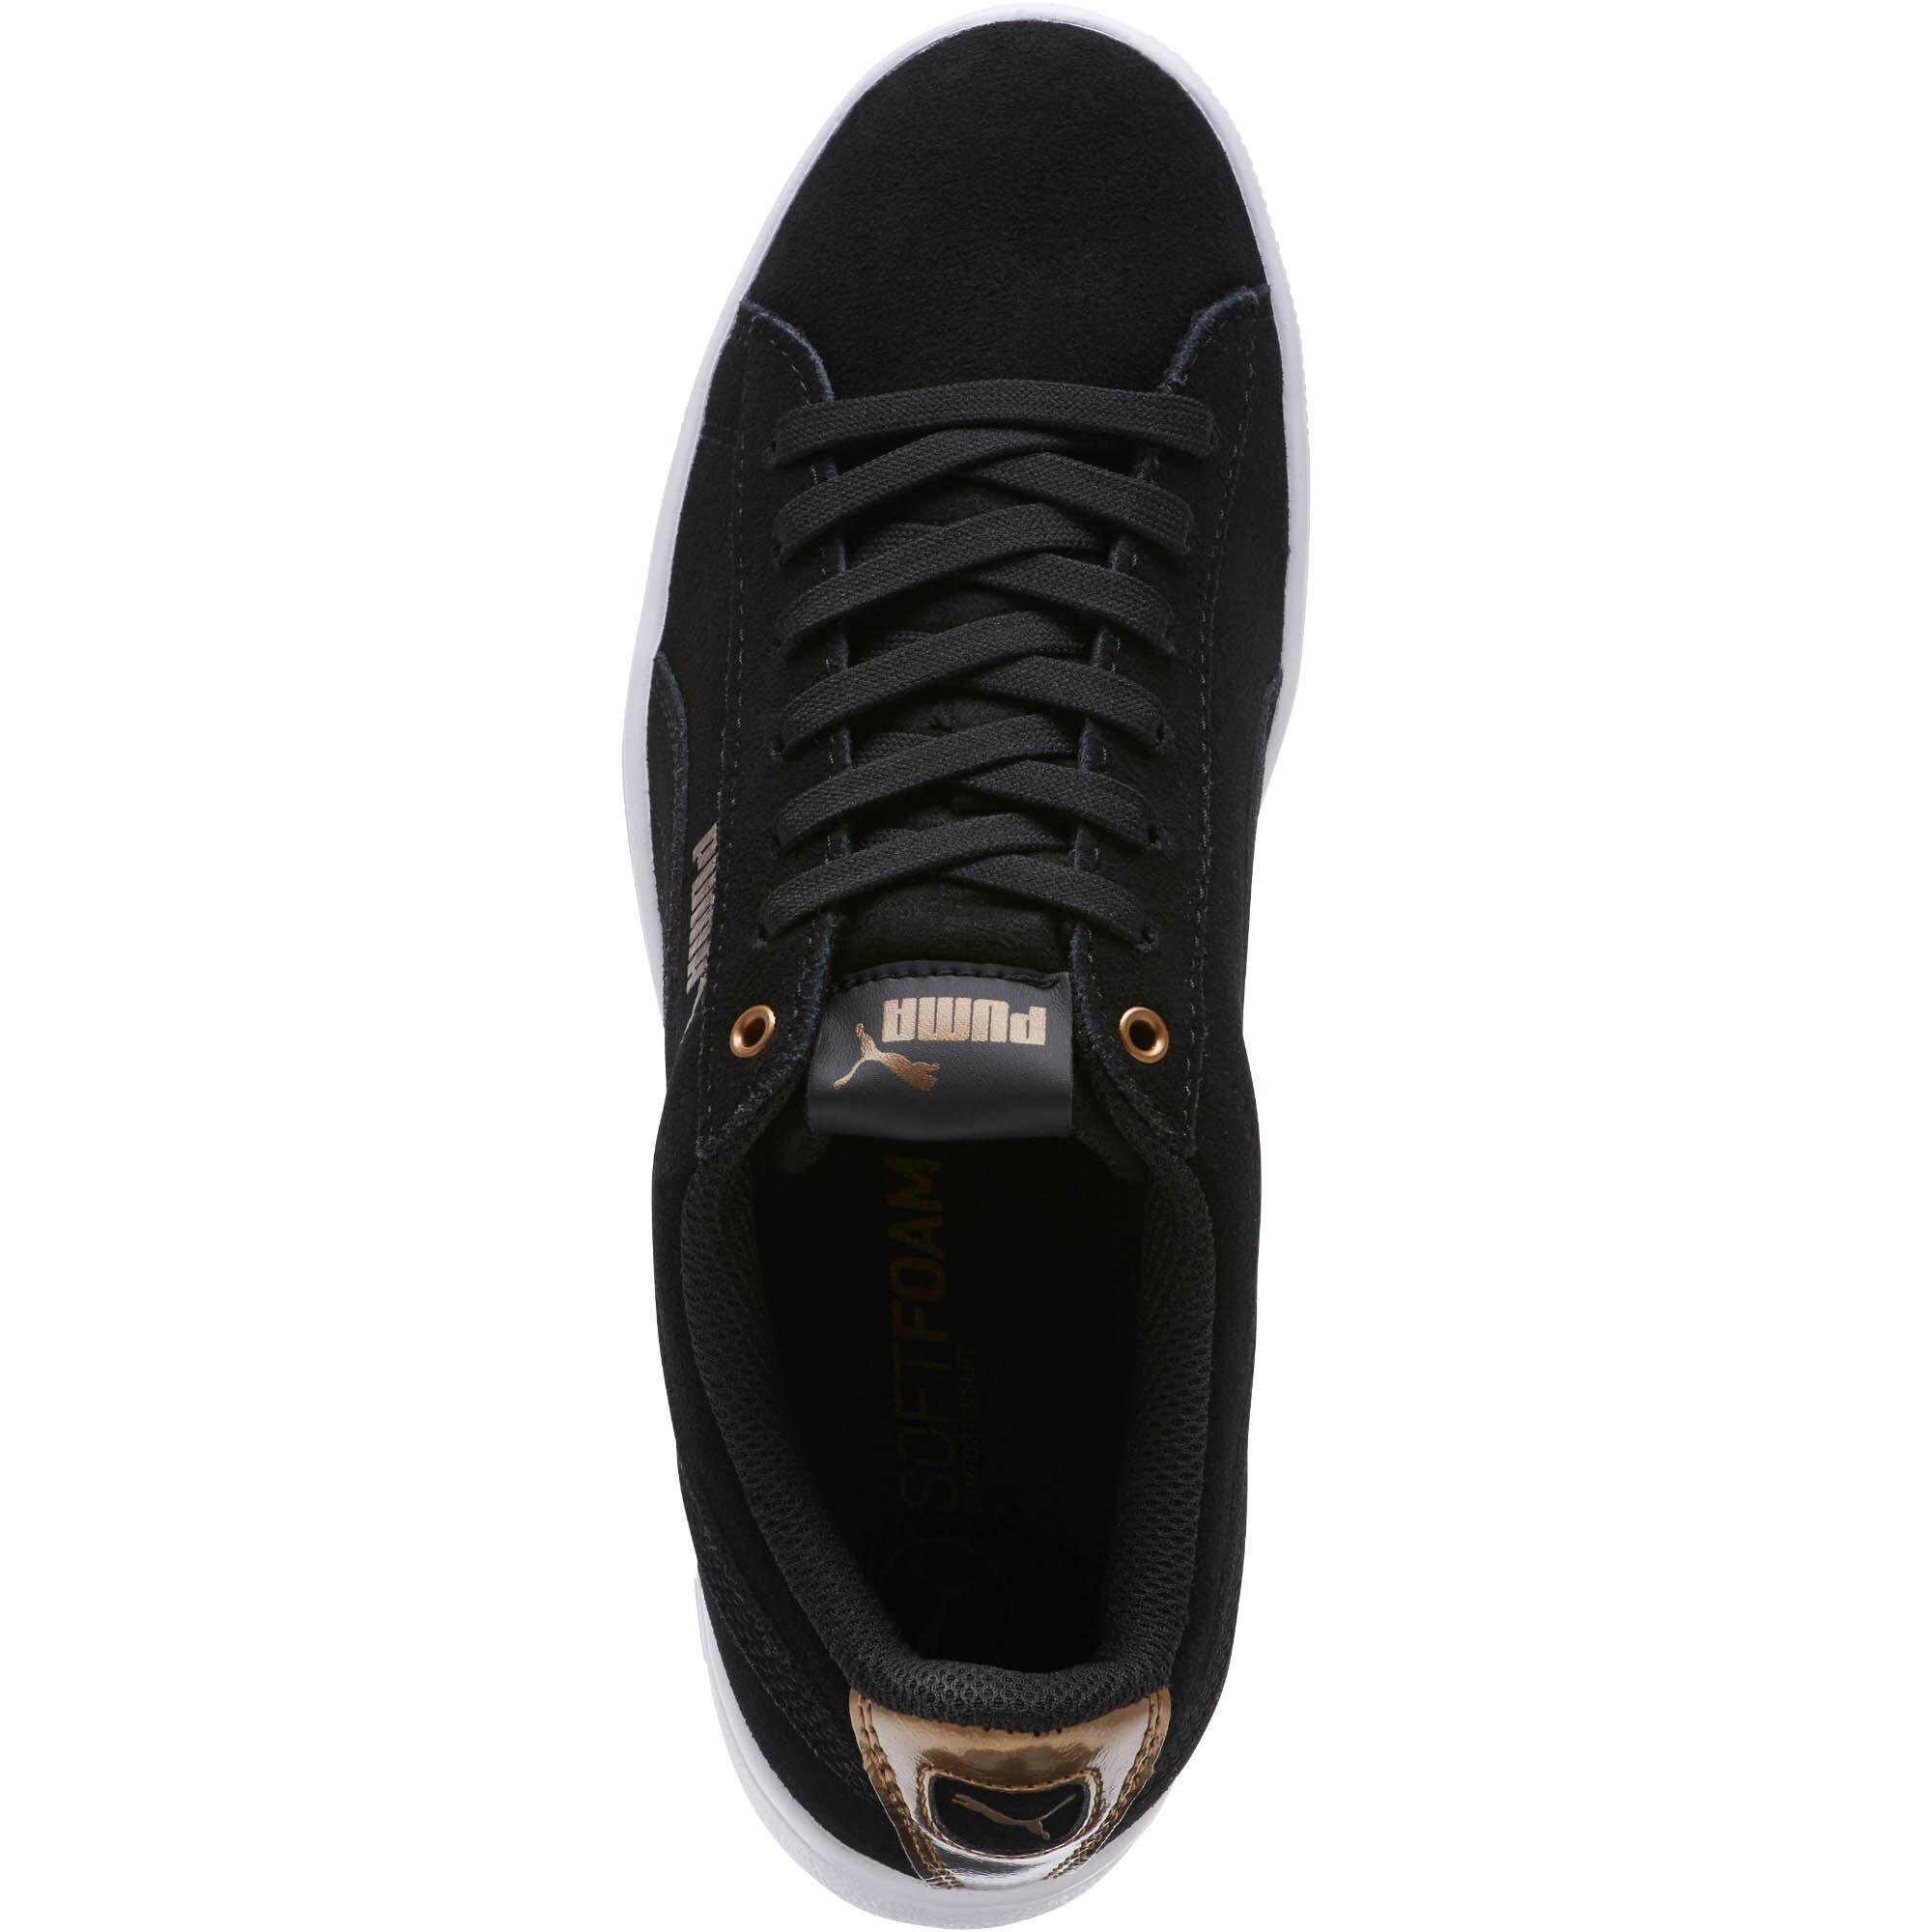 PUMA Puma Vikky AOS Metallic Sneakers Women Shoe Basics